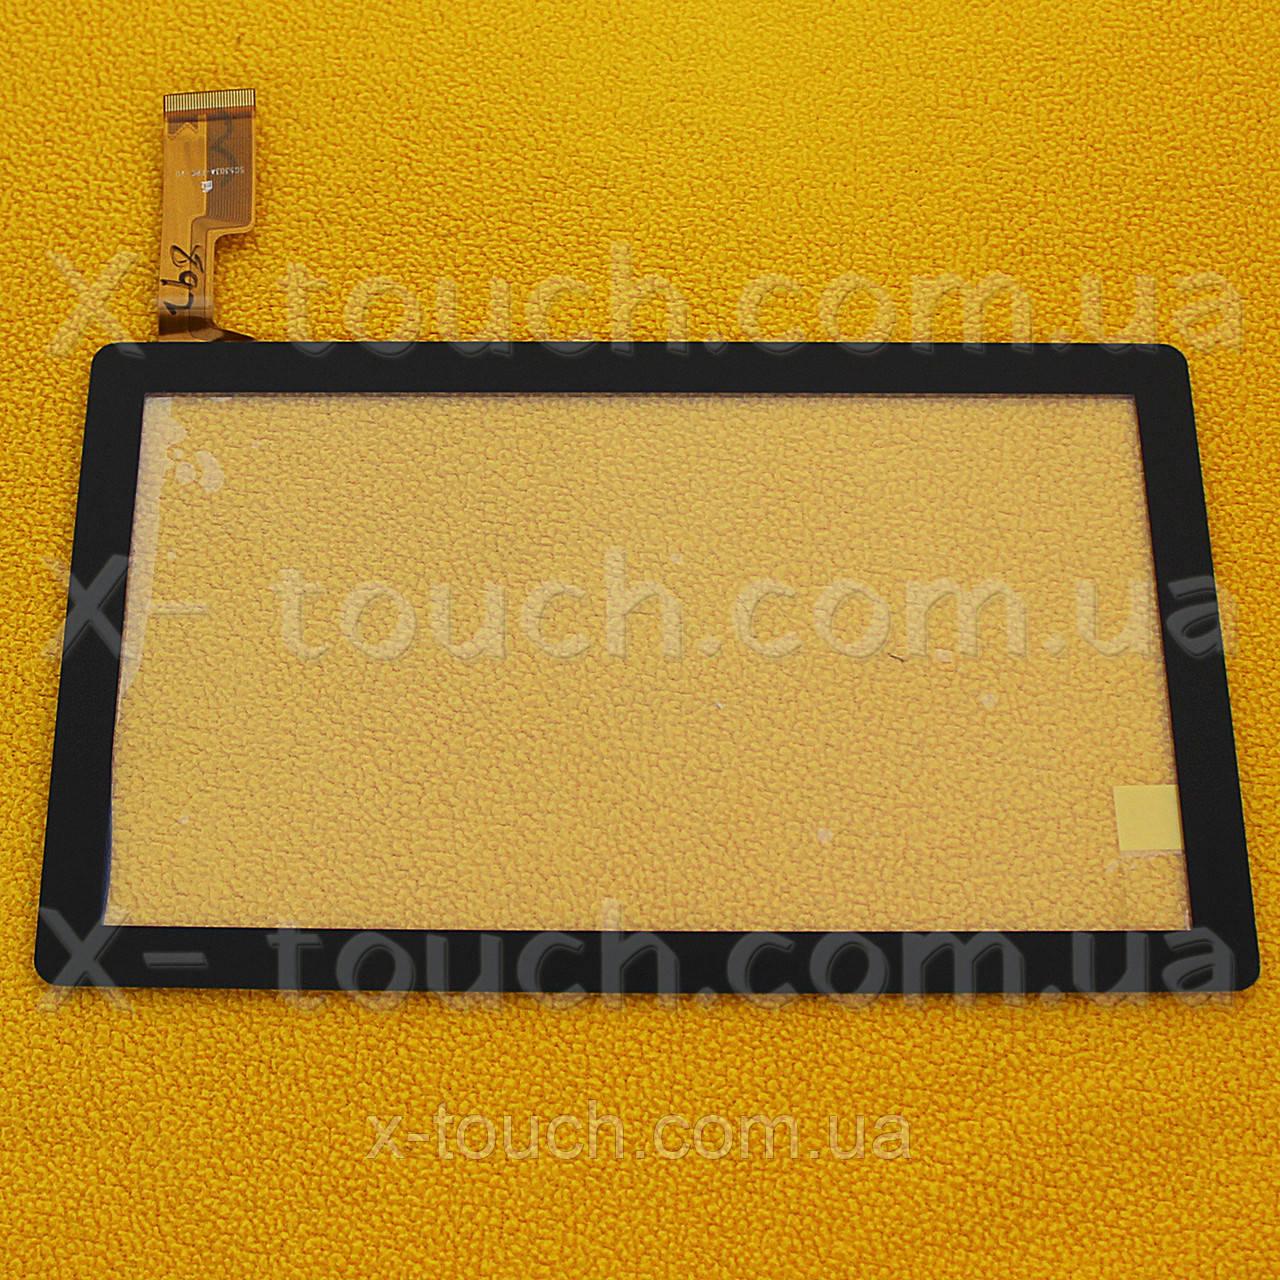 Тачскрин, сенсор  XC-PG0700-04  для планшета